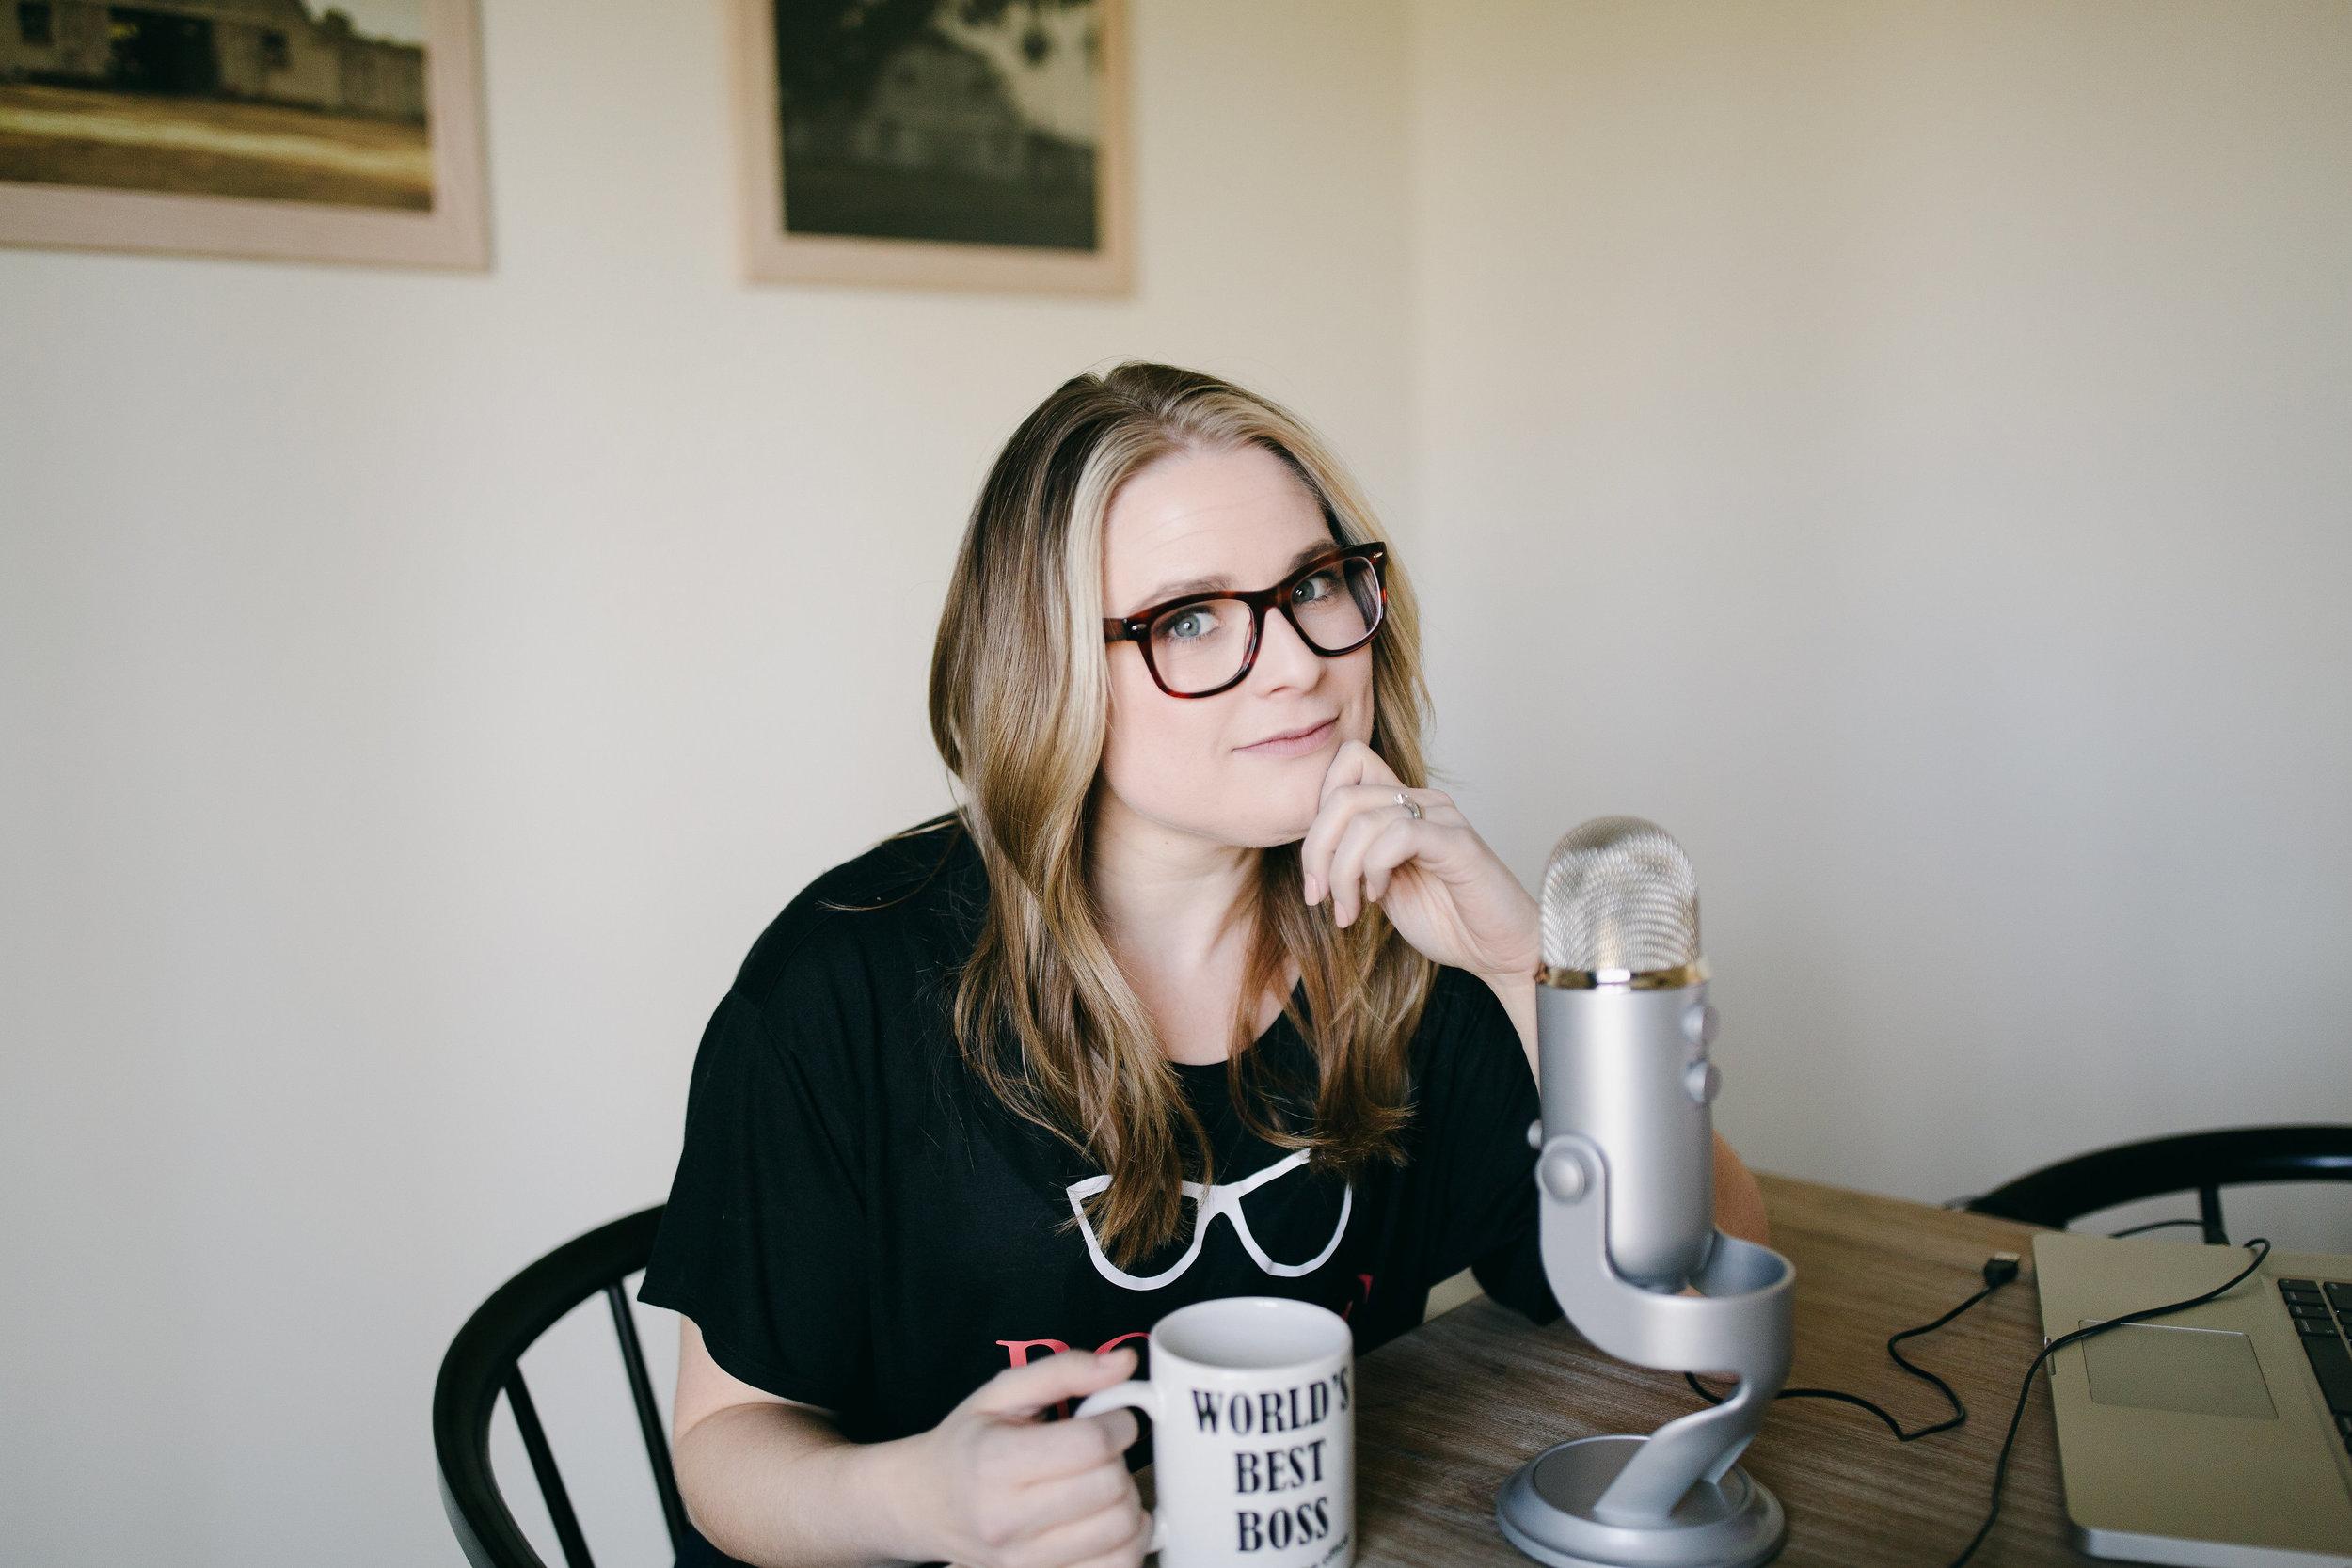 Host/curator, leslie eiler thompson - << more about Leslie >>